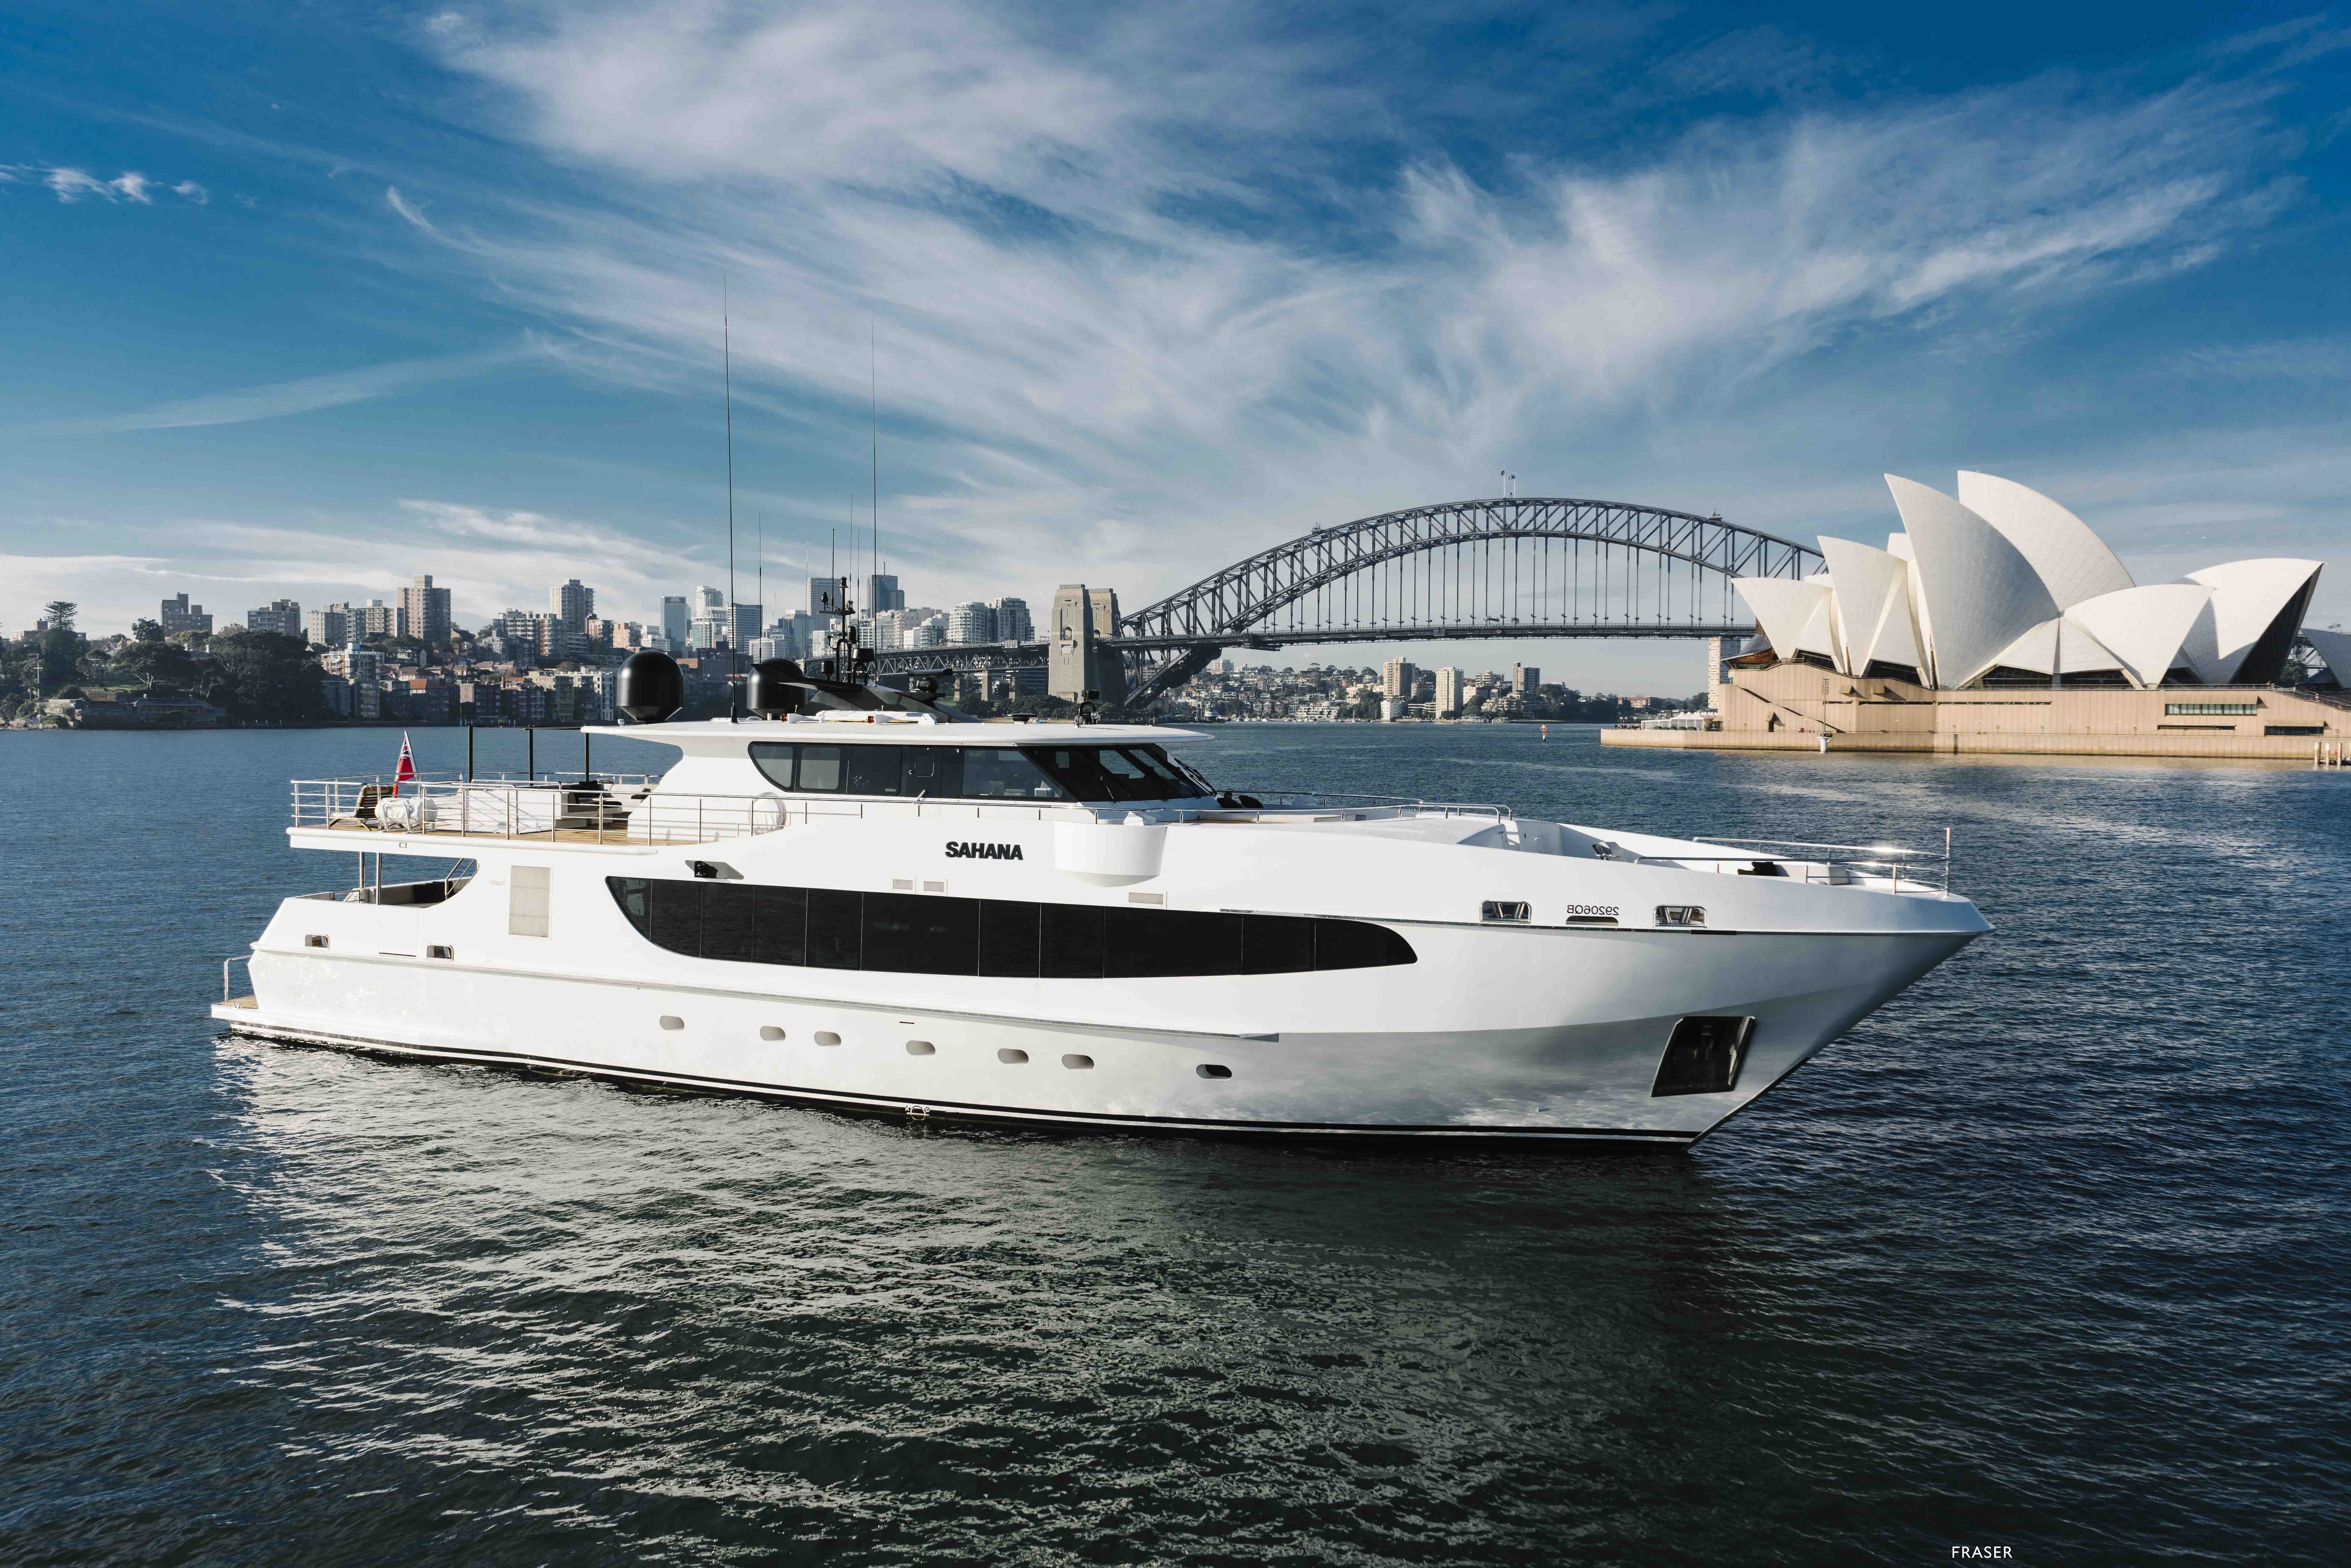 SAHANA yacht